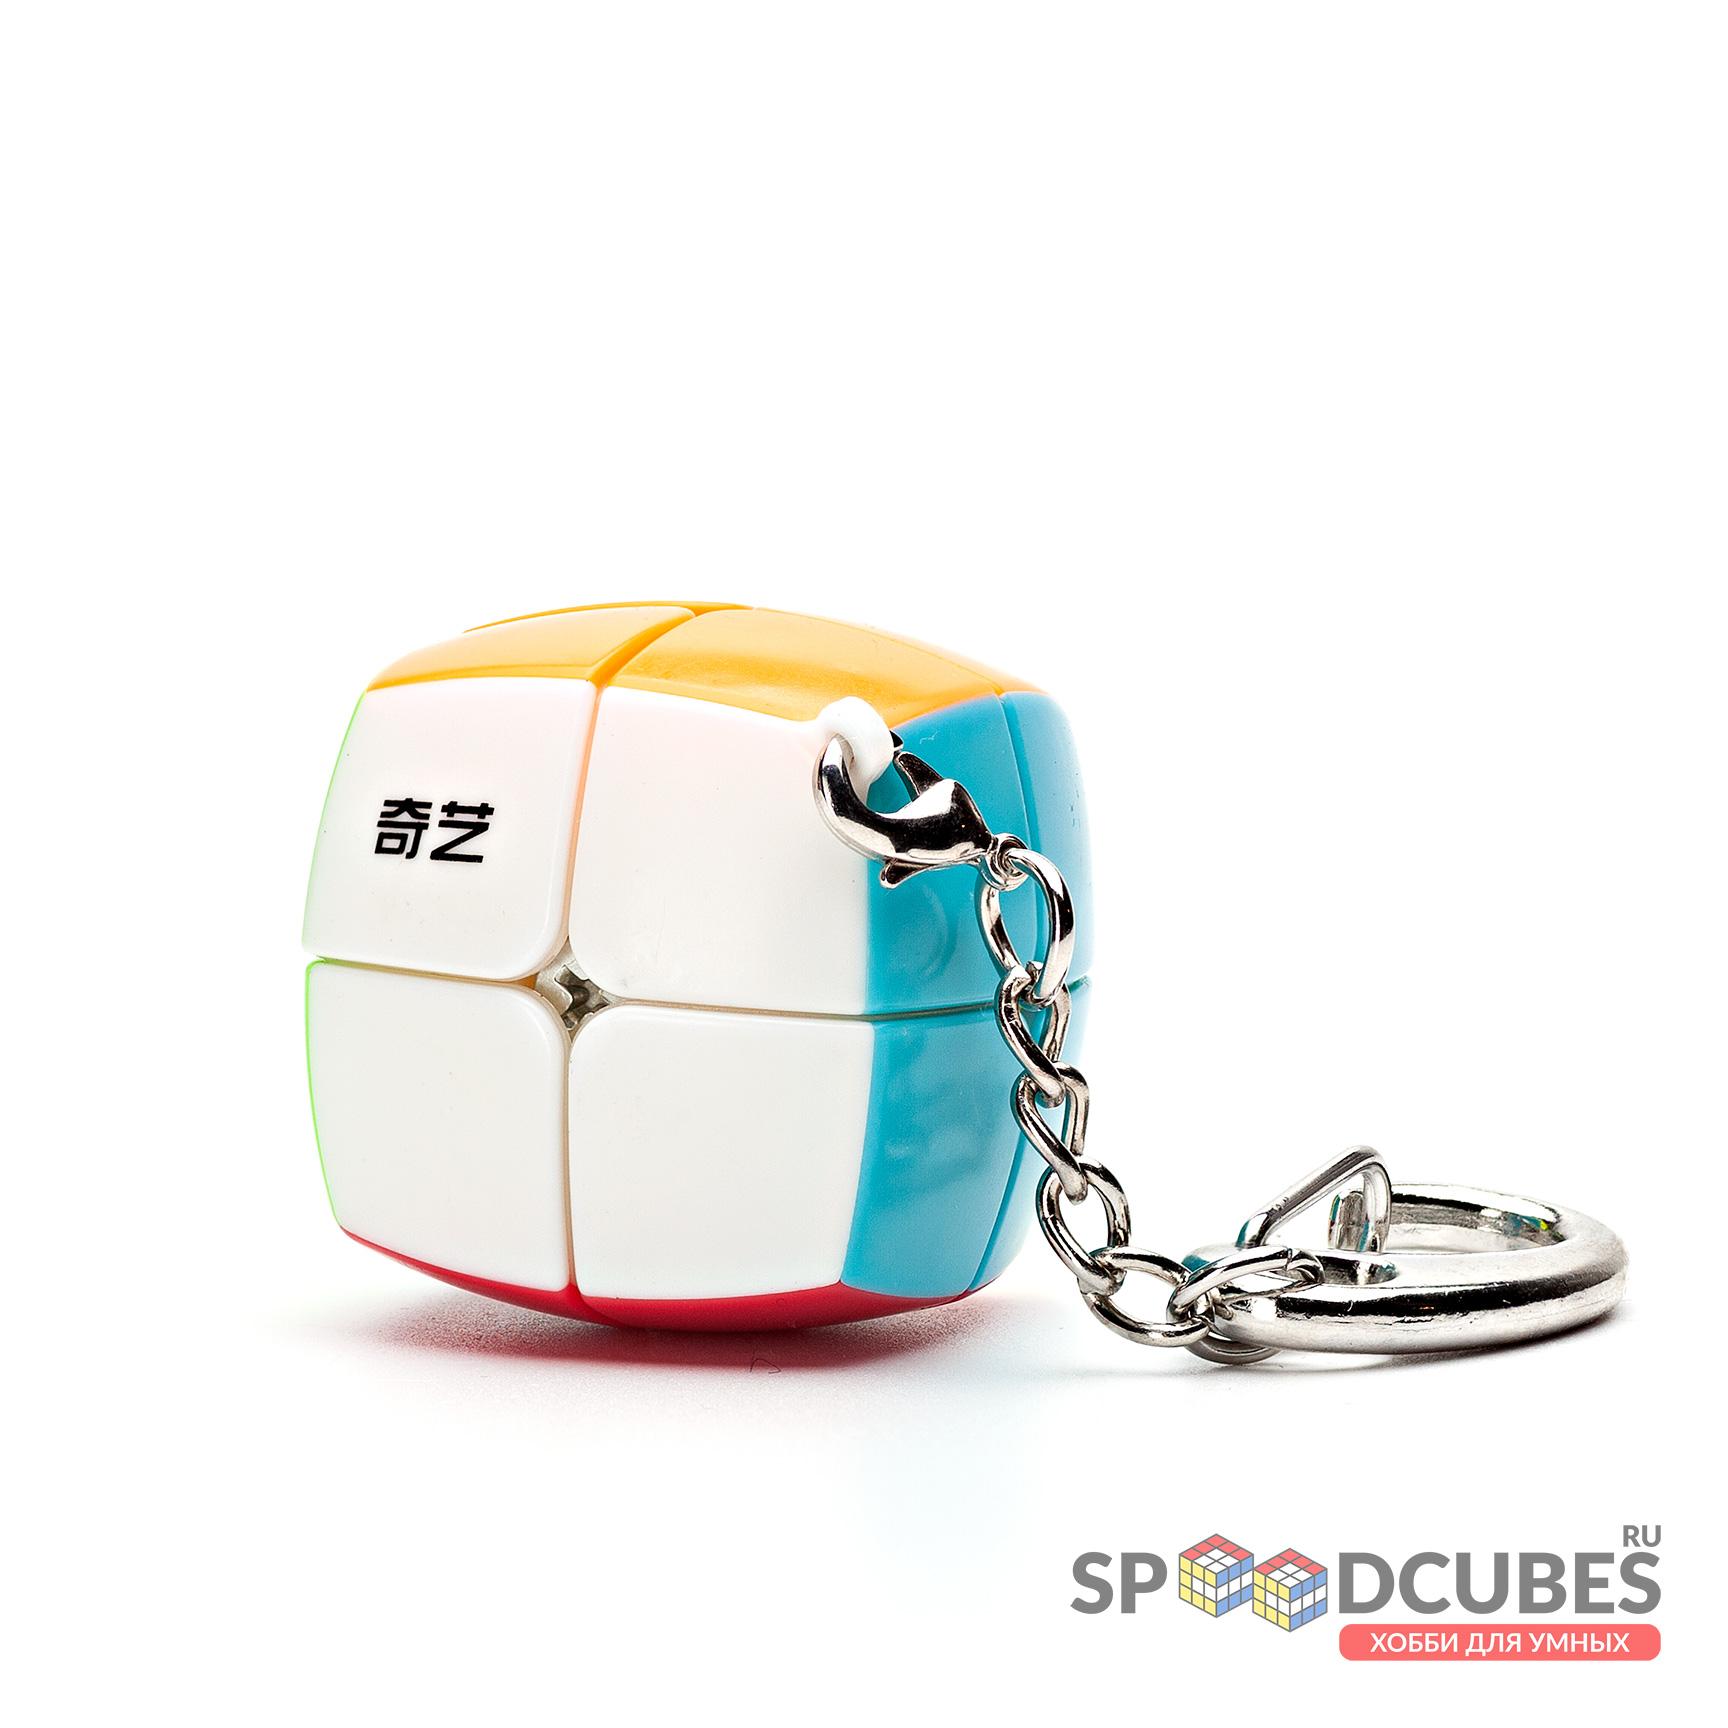 QiYi (MoFangGe) 2x2x2 Keychain Mini брелок